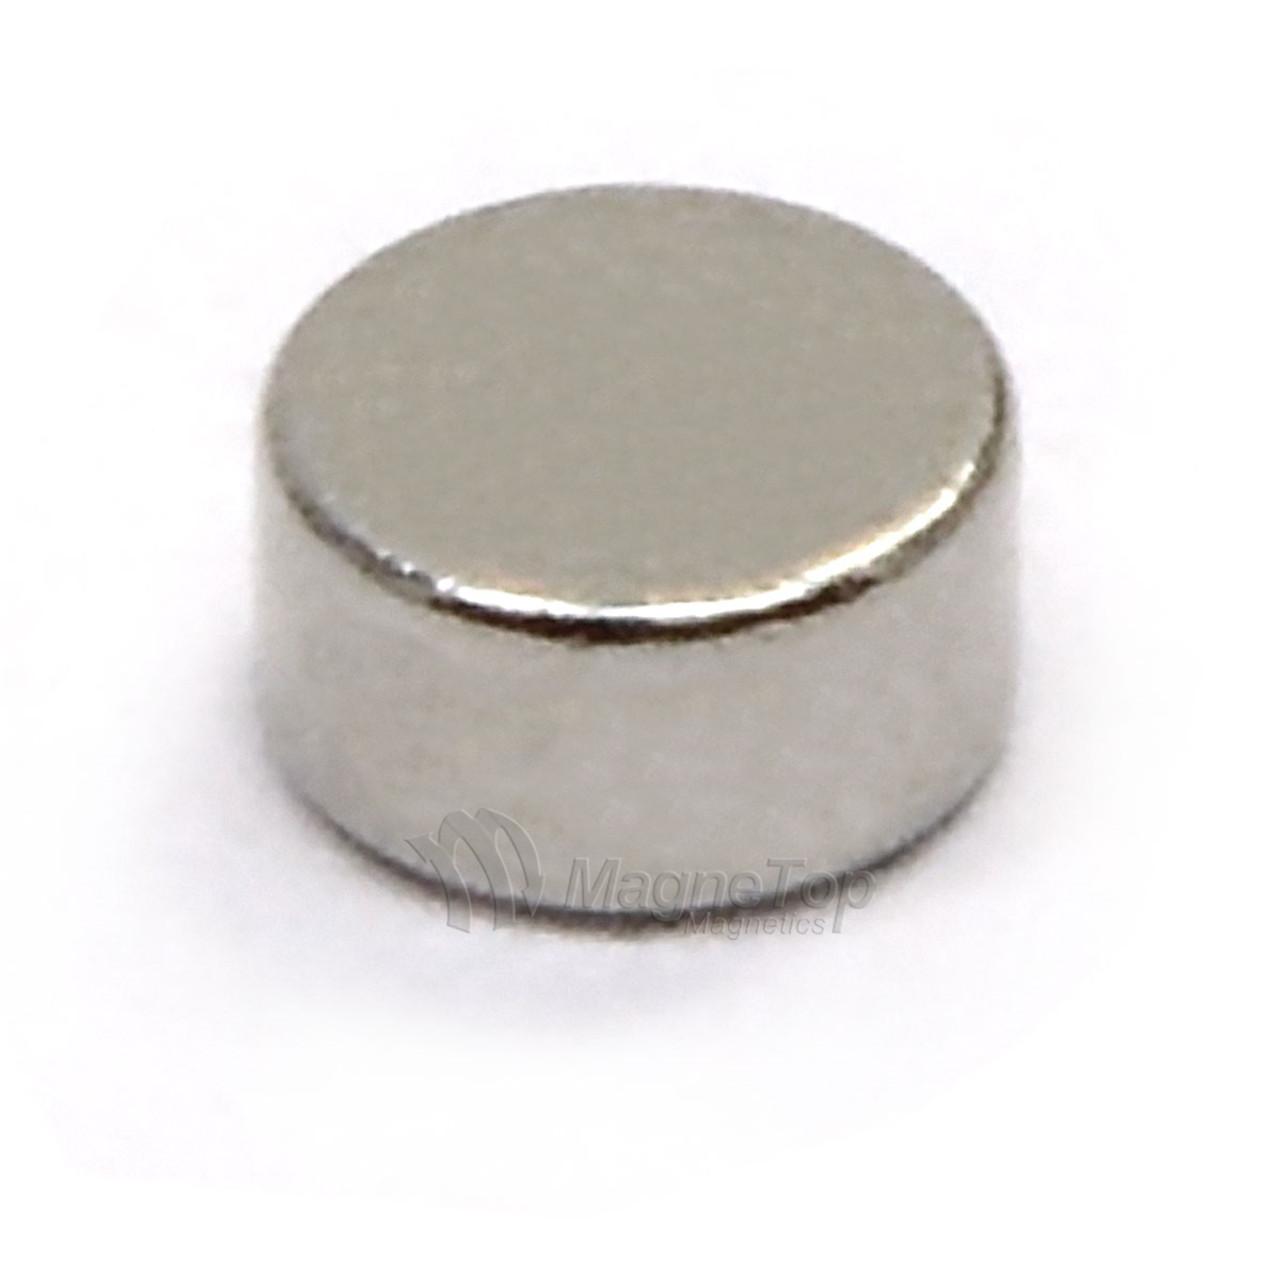 Neodymium Disk  -  3mm x 1.5mm - N50